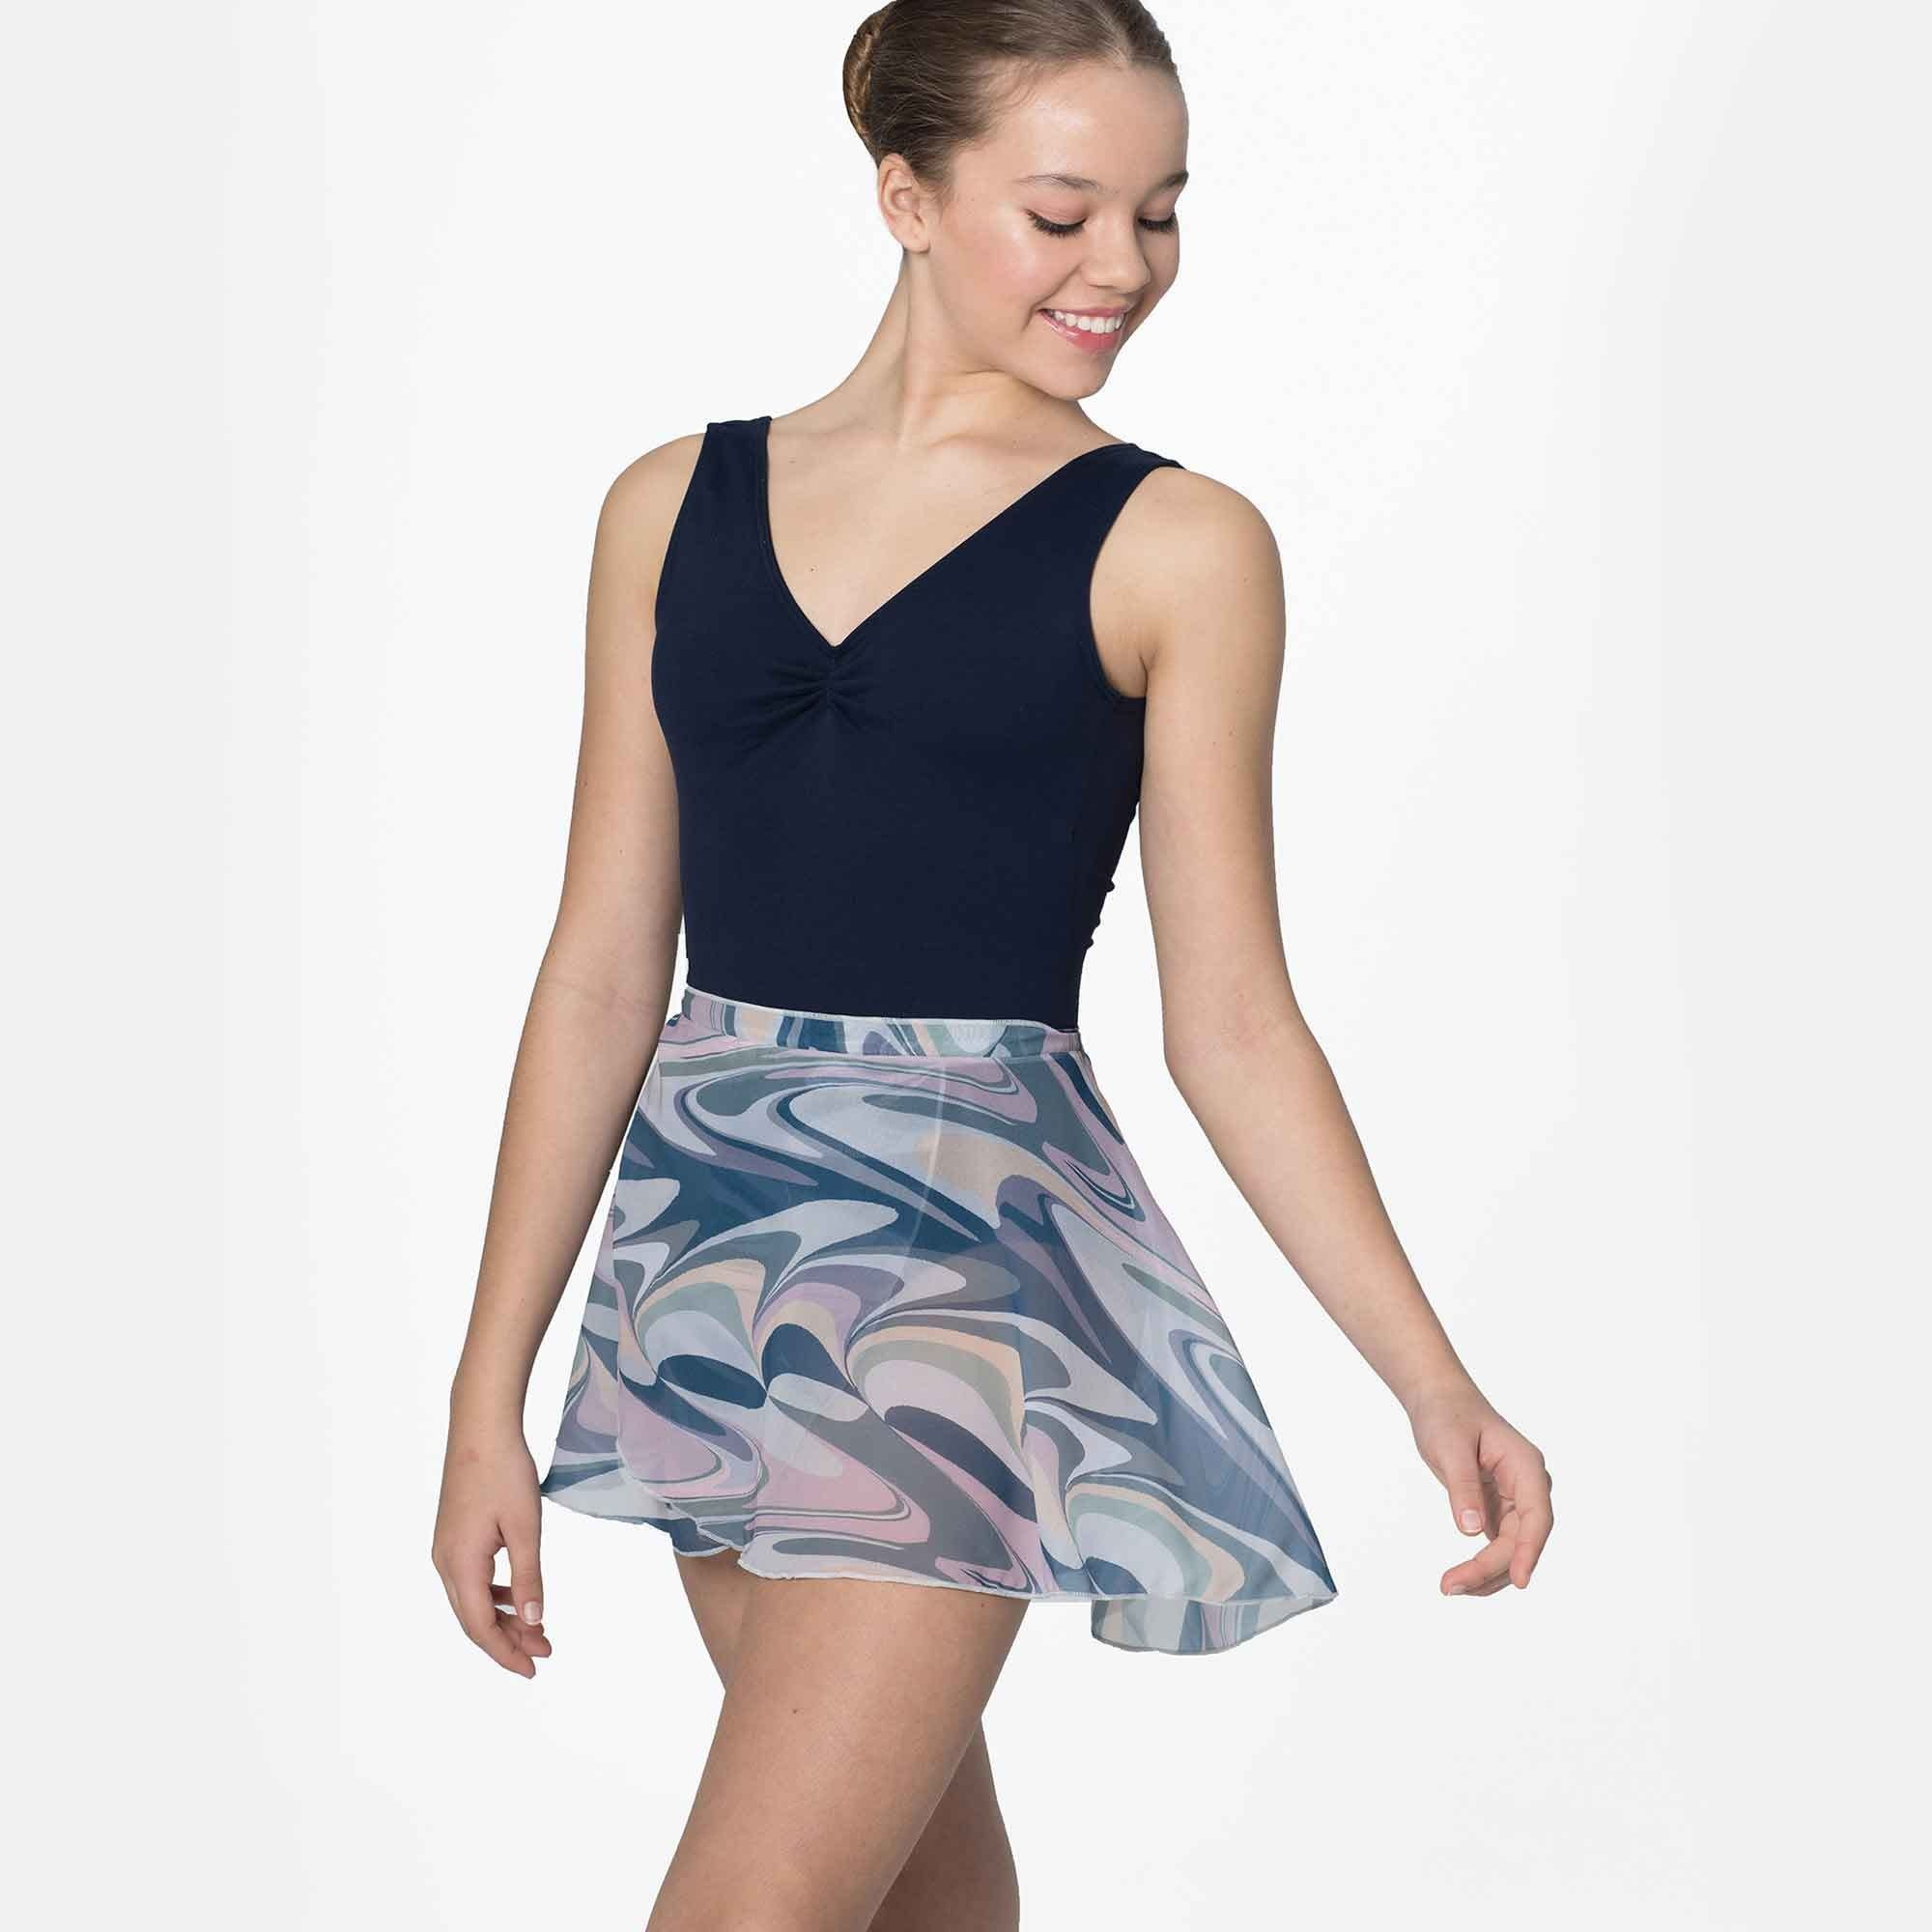 Intermezzo 7974-258-Wrap Skirt